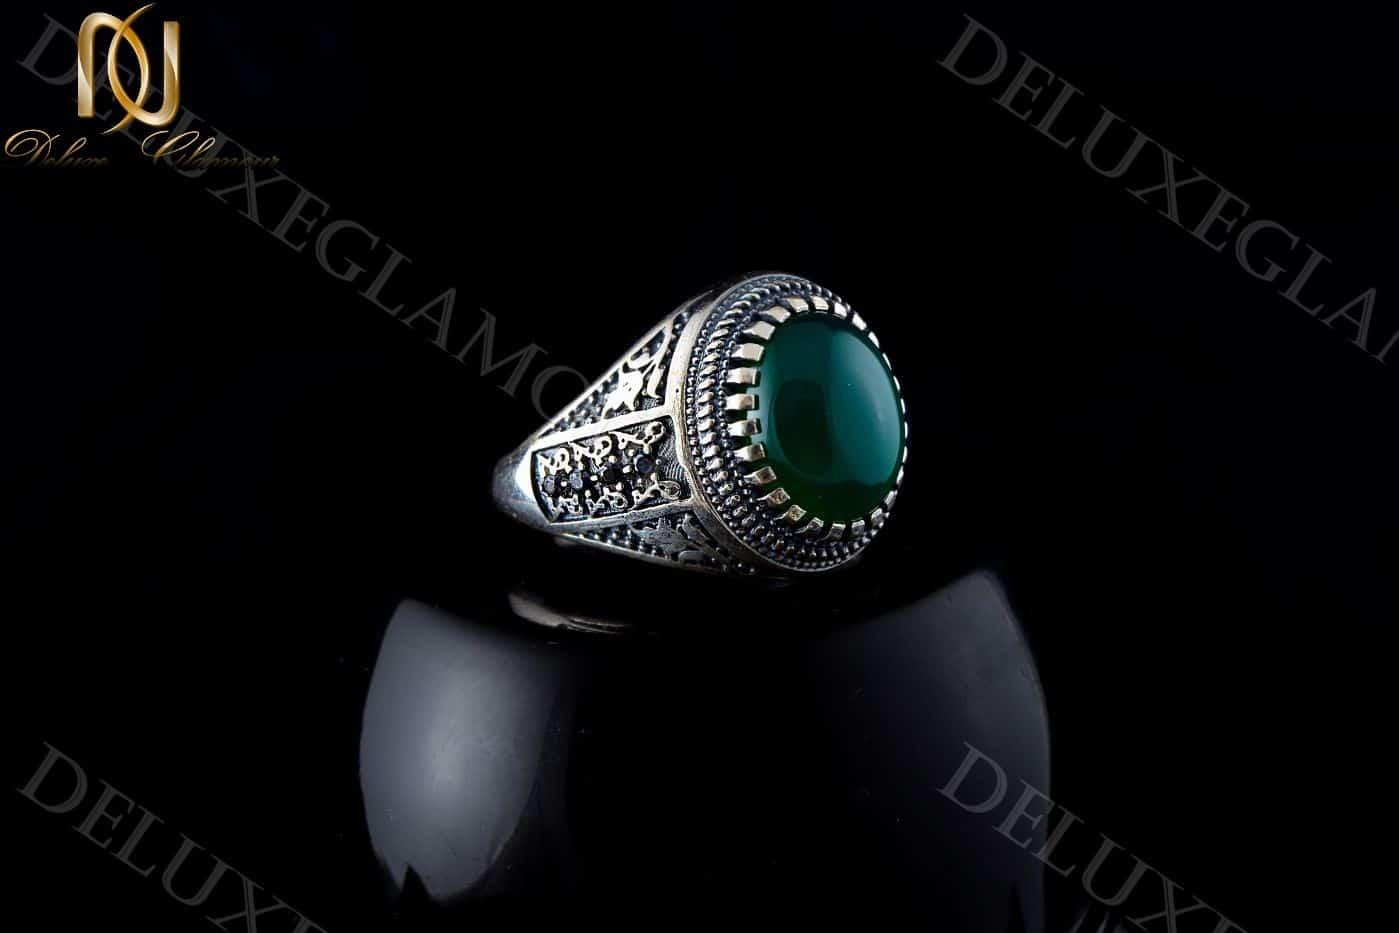 انگشتر مردانه نقره با سنگ عقیق سبز Rg-n201 - زمینه مشکی